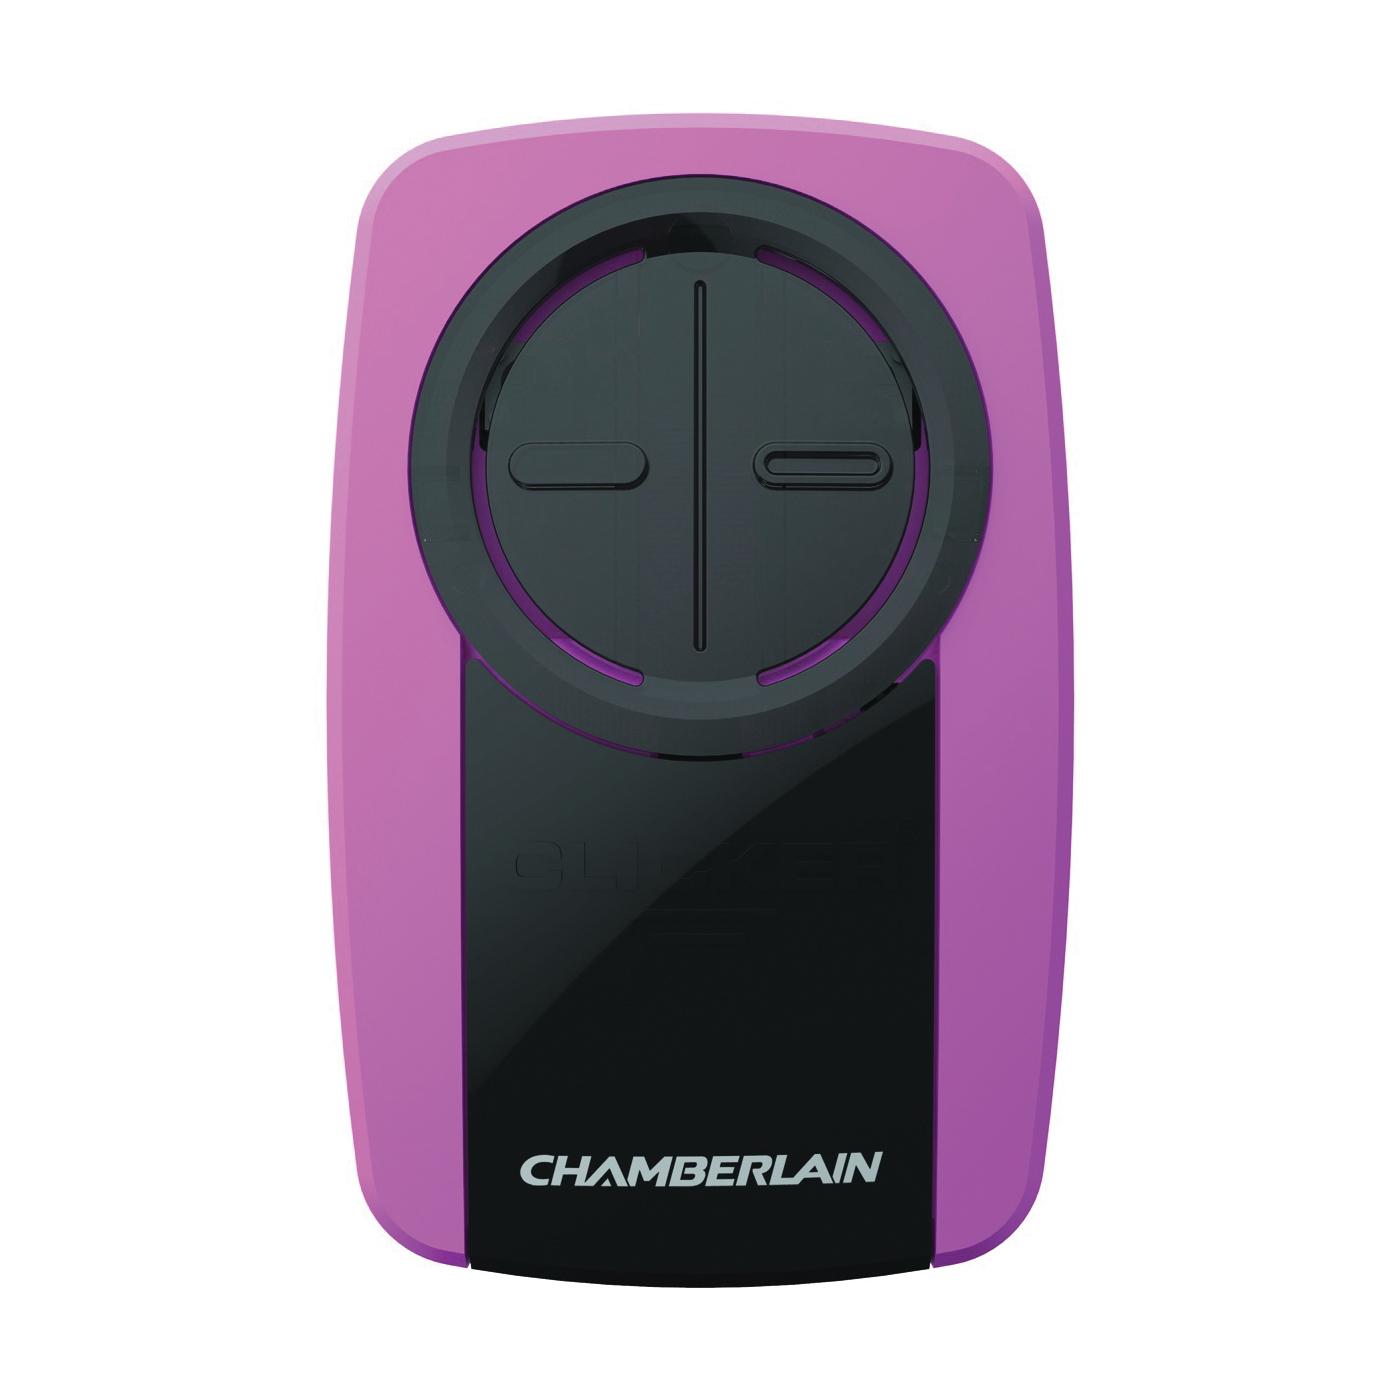 Chamberlain KLIK3U-PK